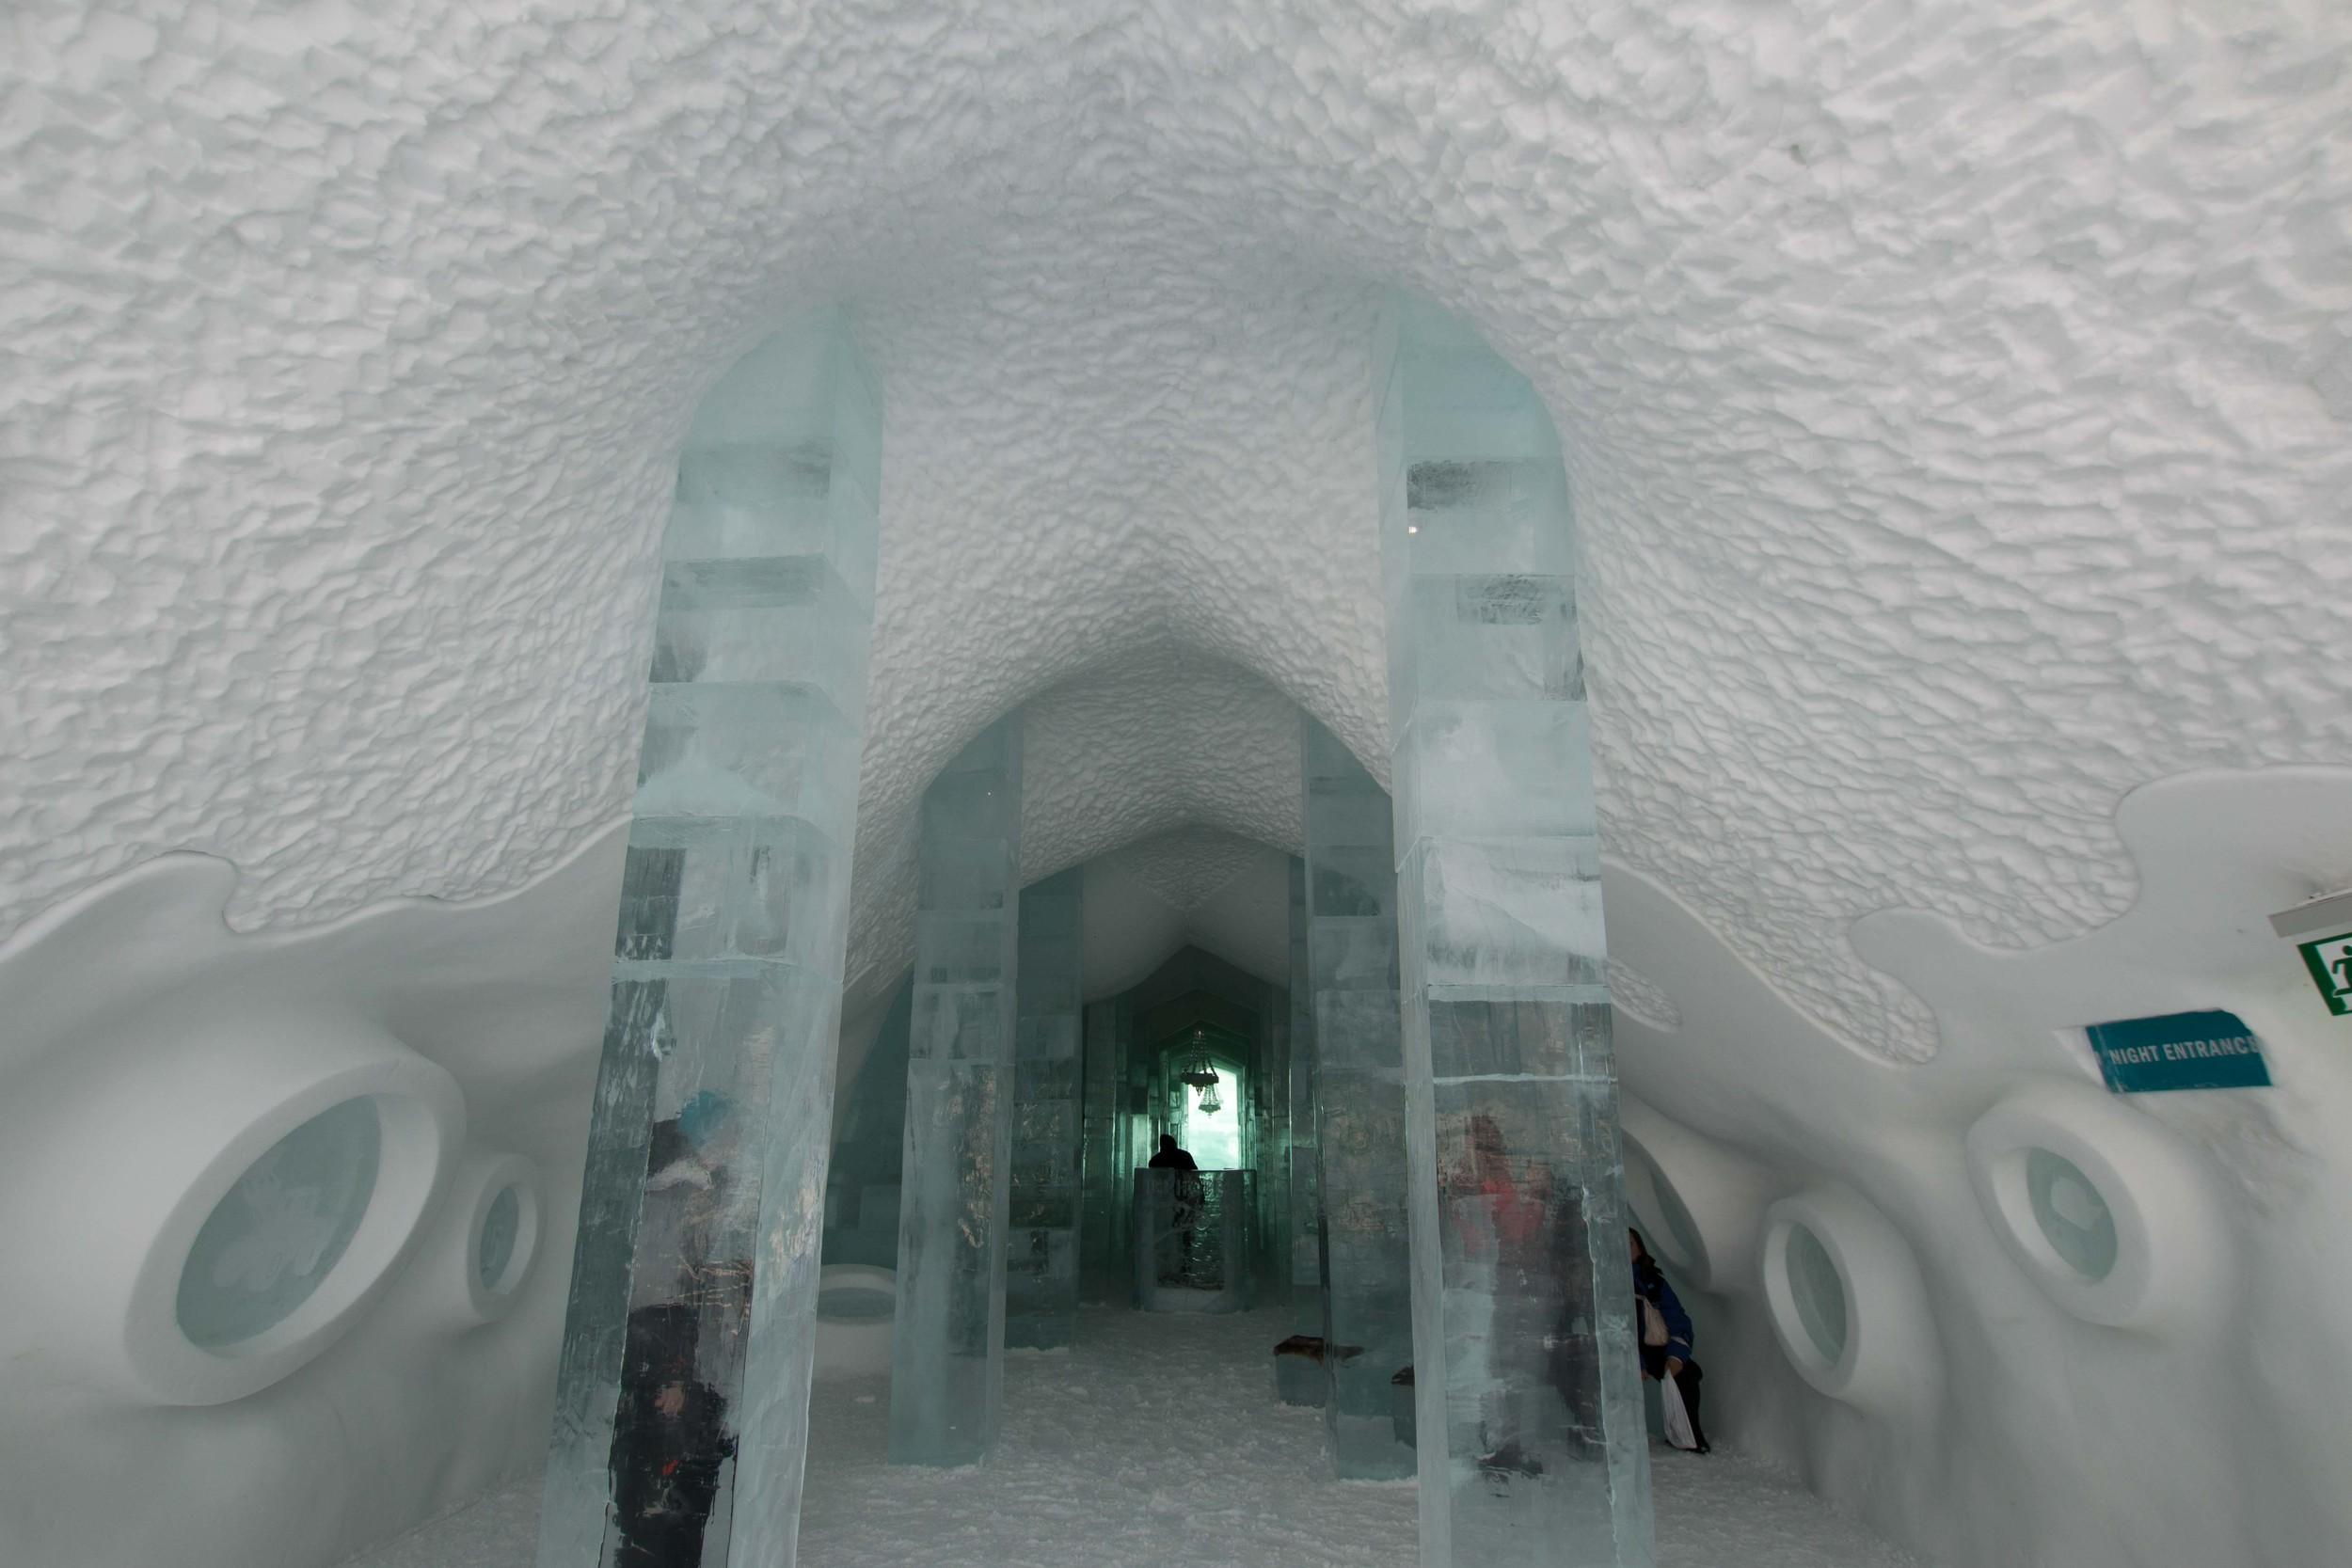 Sneak peek into the ICEHOTEL